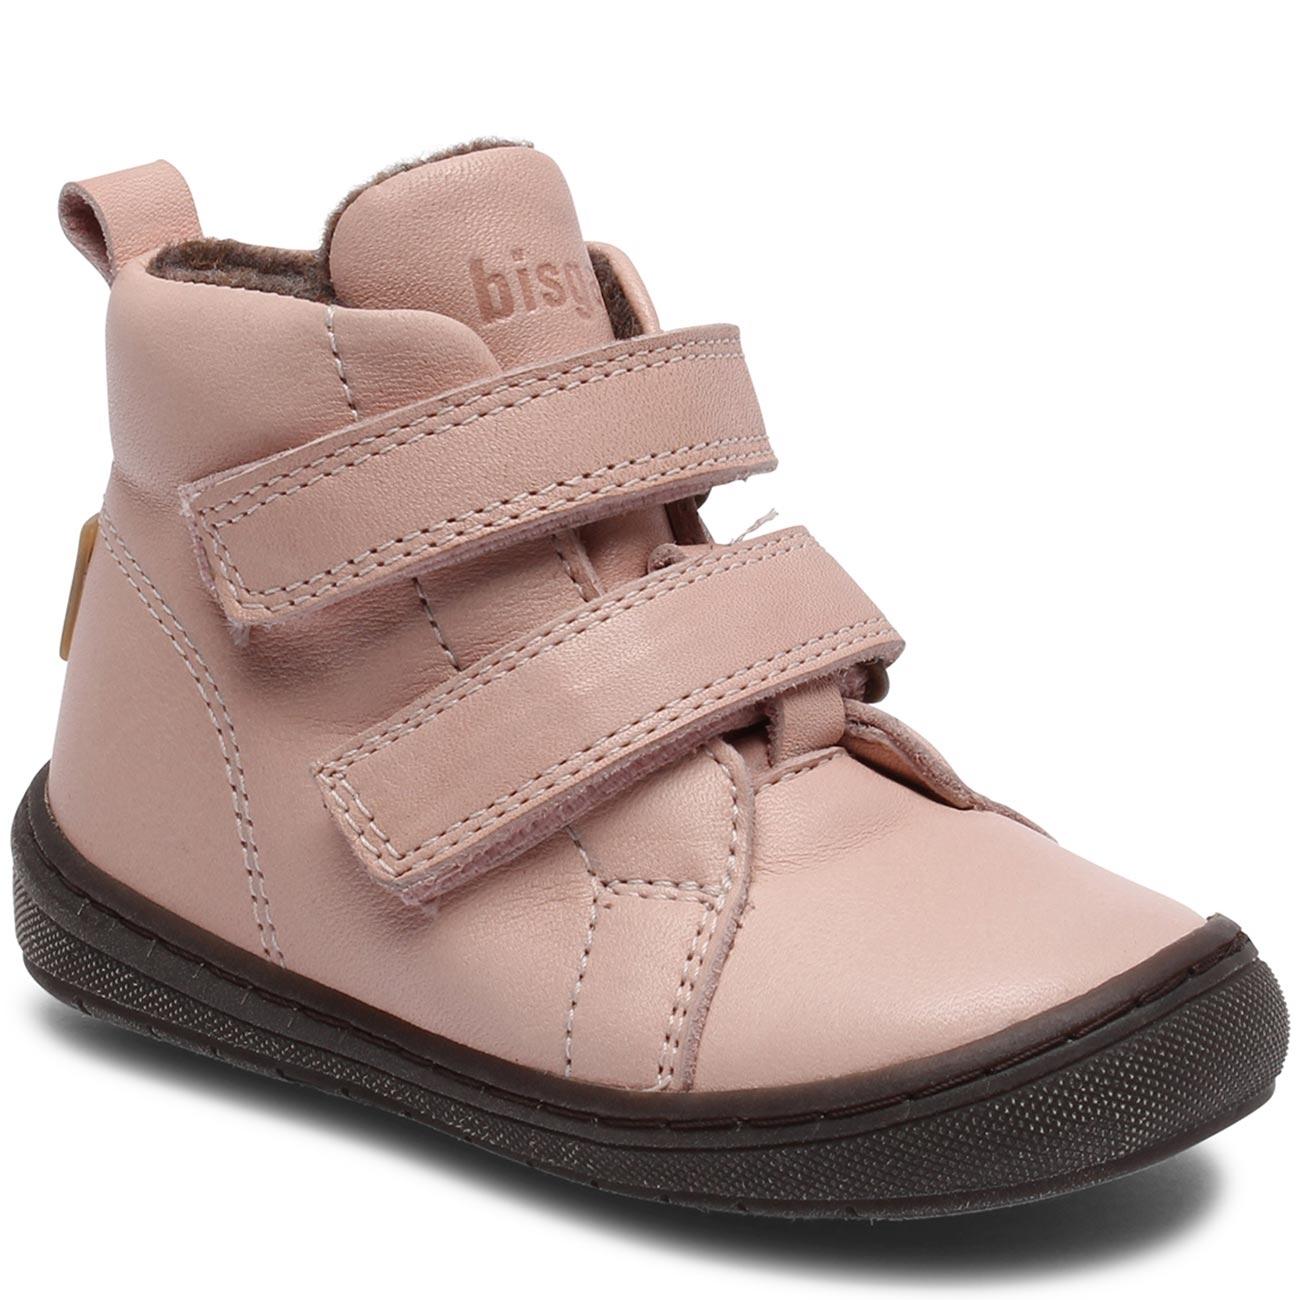 Bisgaard TEX Prewalker Boots Dee Nude